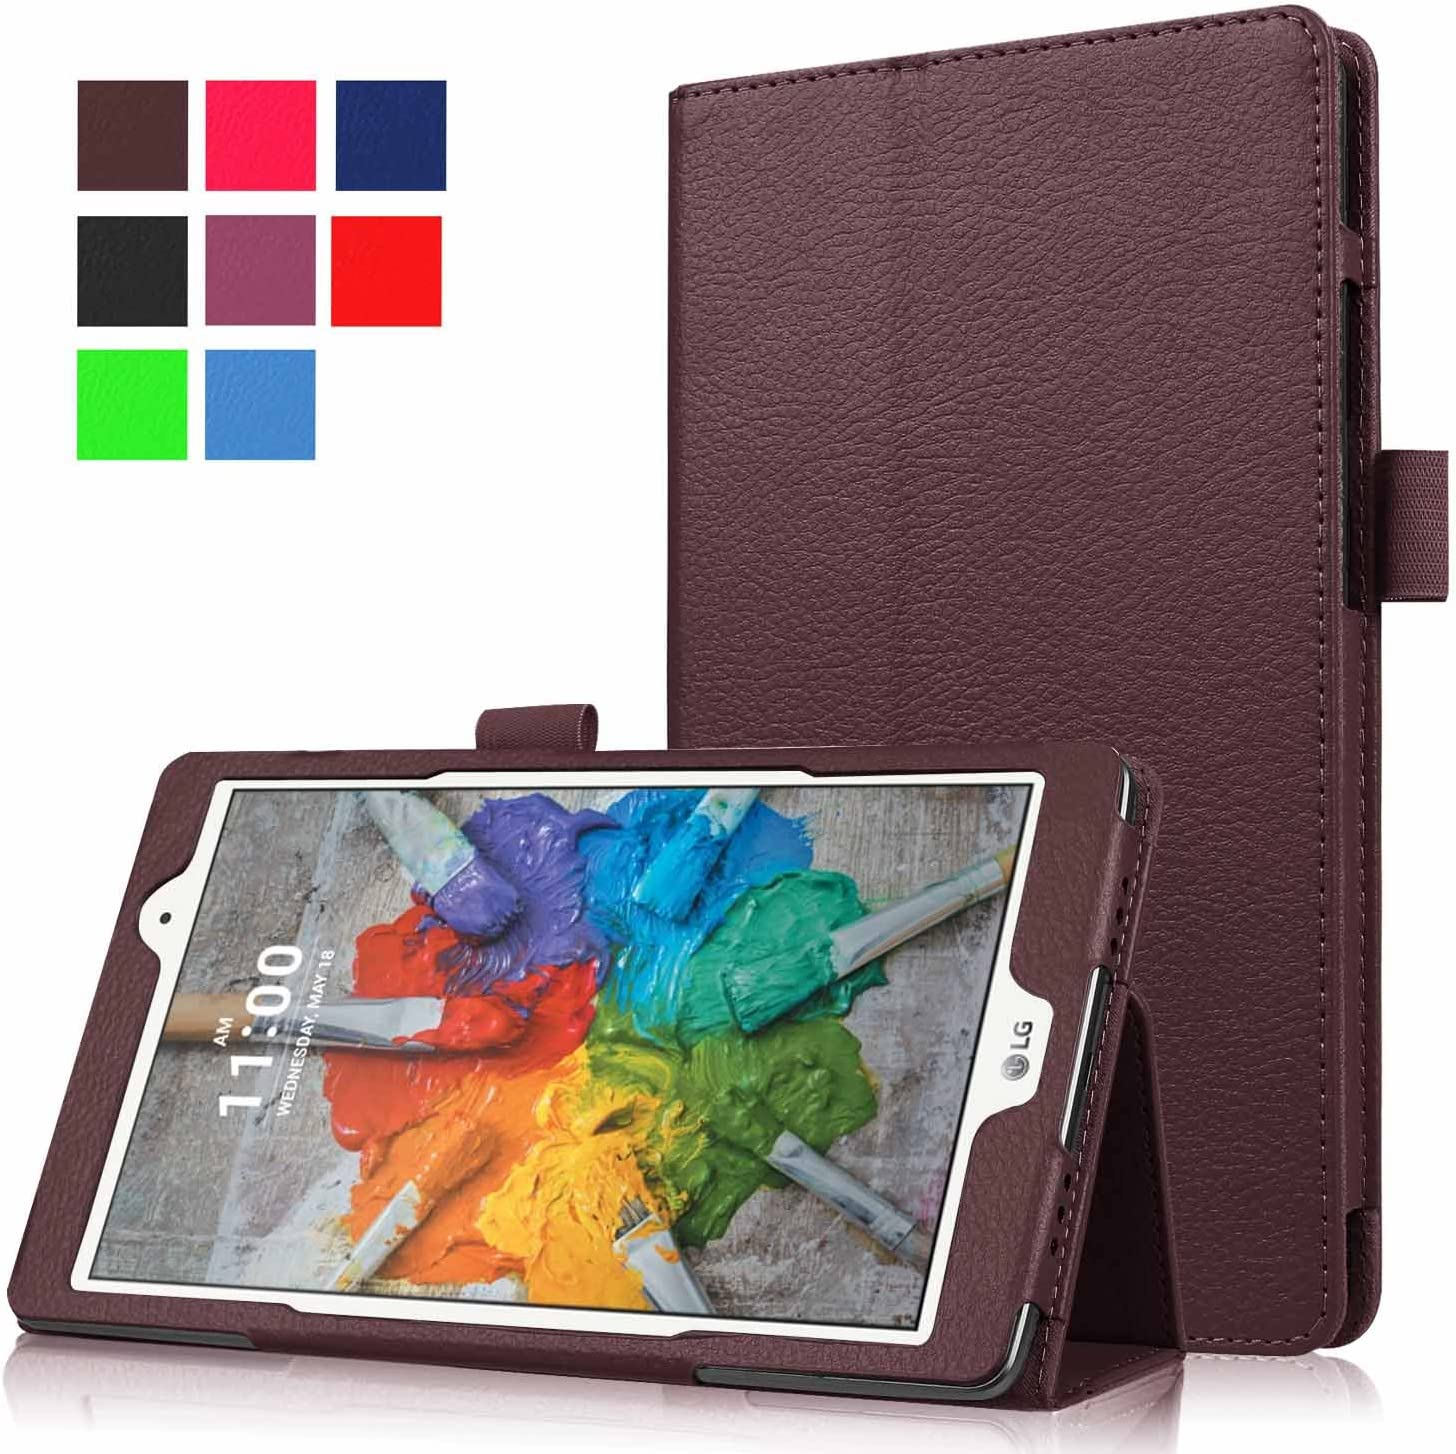 Asng LG G Pad X 8.0 / G Pad III 8.0 Case - Slim Folding Stand Cover Smart Case for LG G Pad X 8.0 (V521) / AT&T (V520) / LG G Pad III 8.0 (V525) 8-Inch Tablet (Brown)